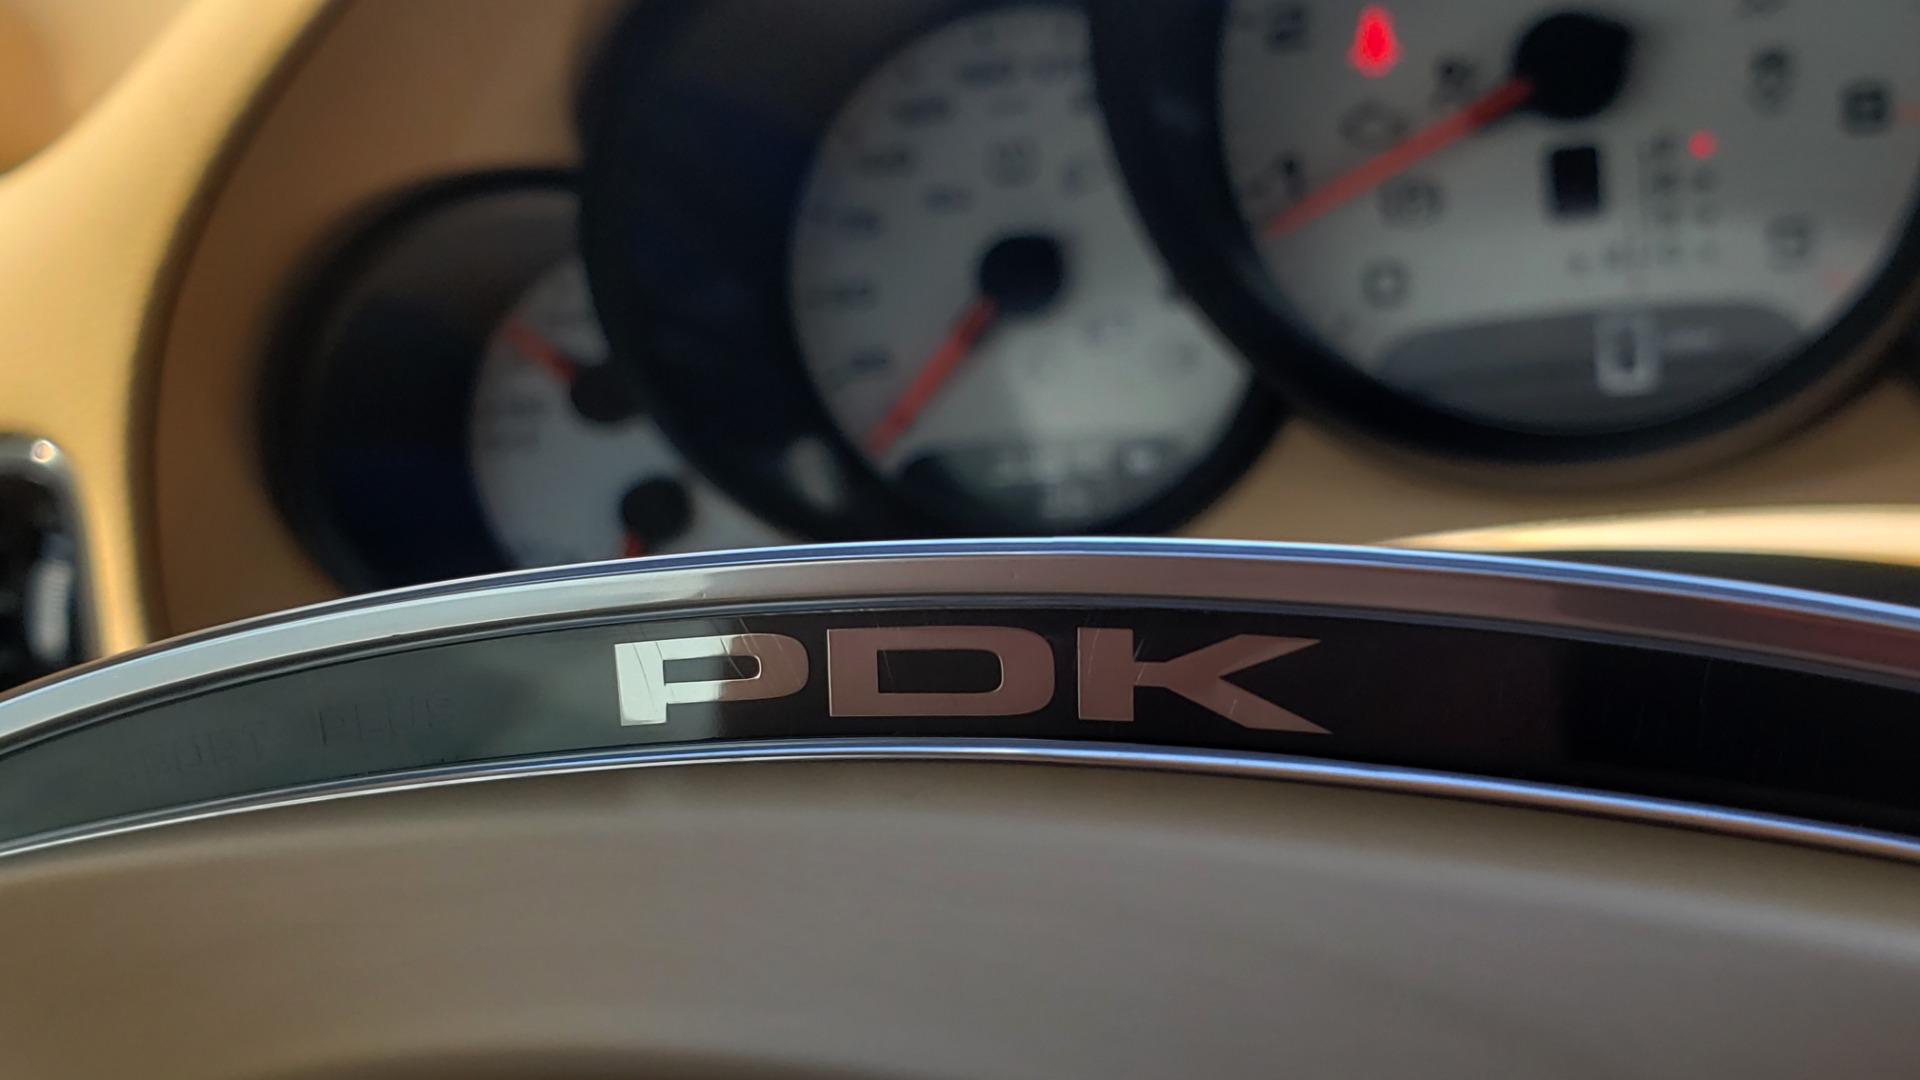 Used 2014 Porsche 911 CARRERA S CABRIOLET / PREM PKG / PDK / NAV / BOSE / SPORT CHRONO for sale $81,995 at Formula Imports in Charlotte NC 28227 65